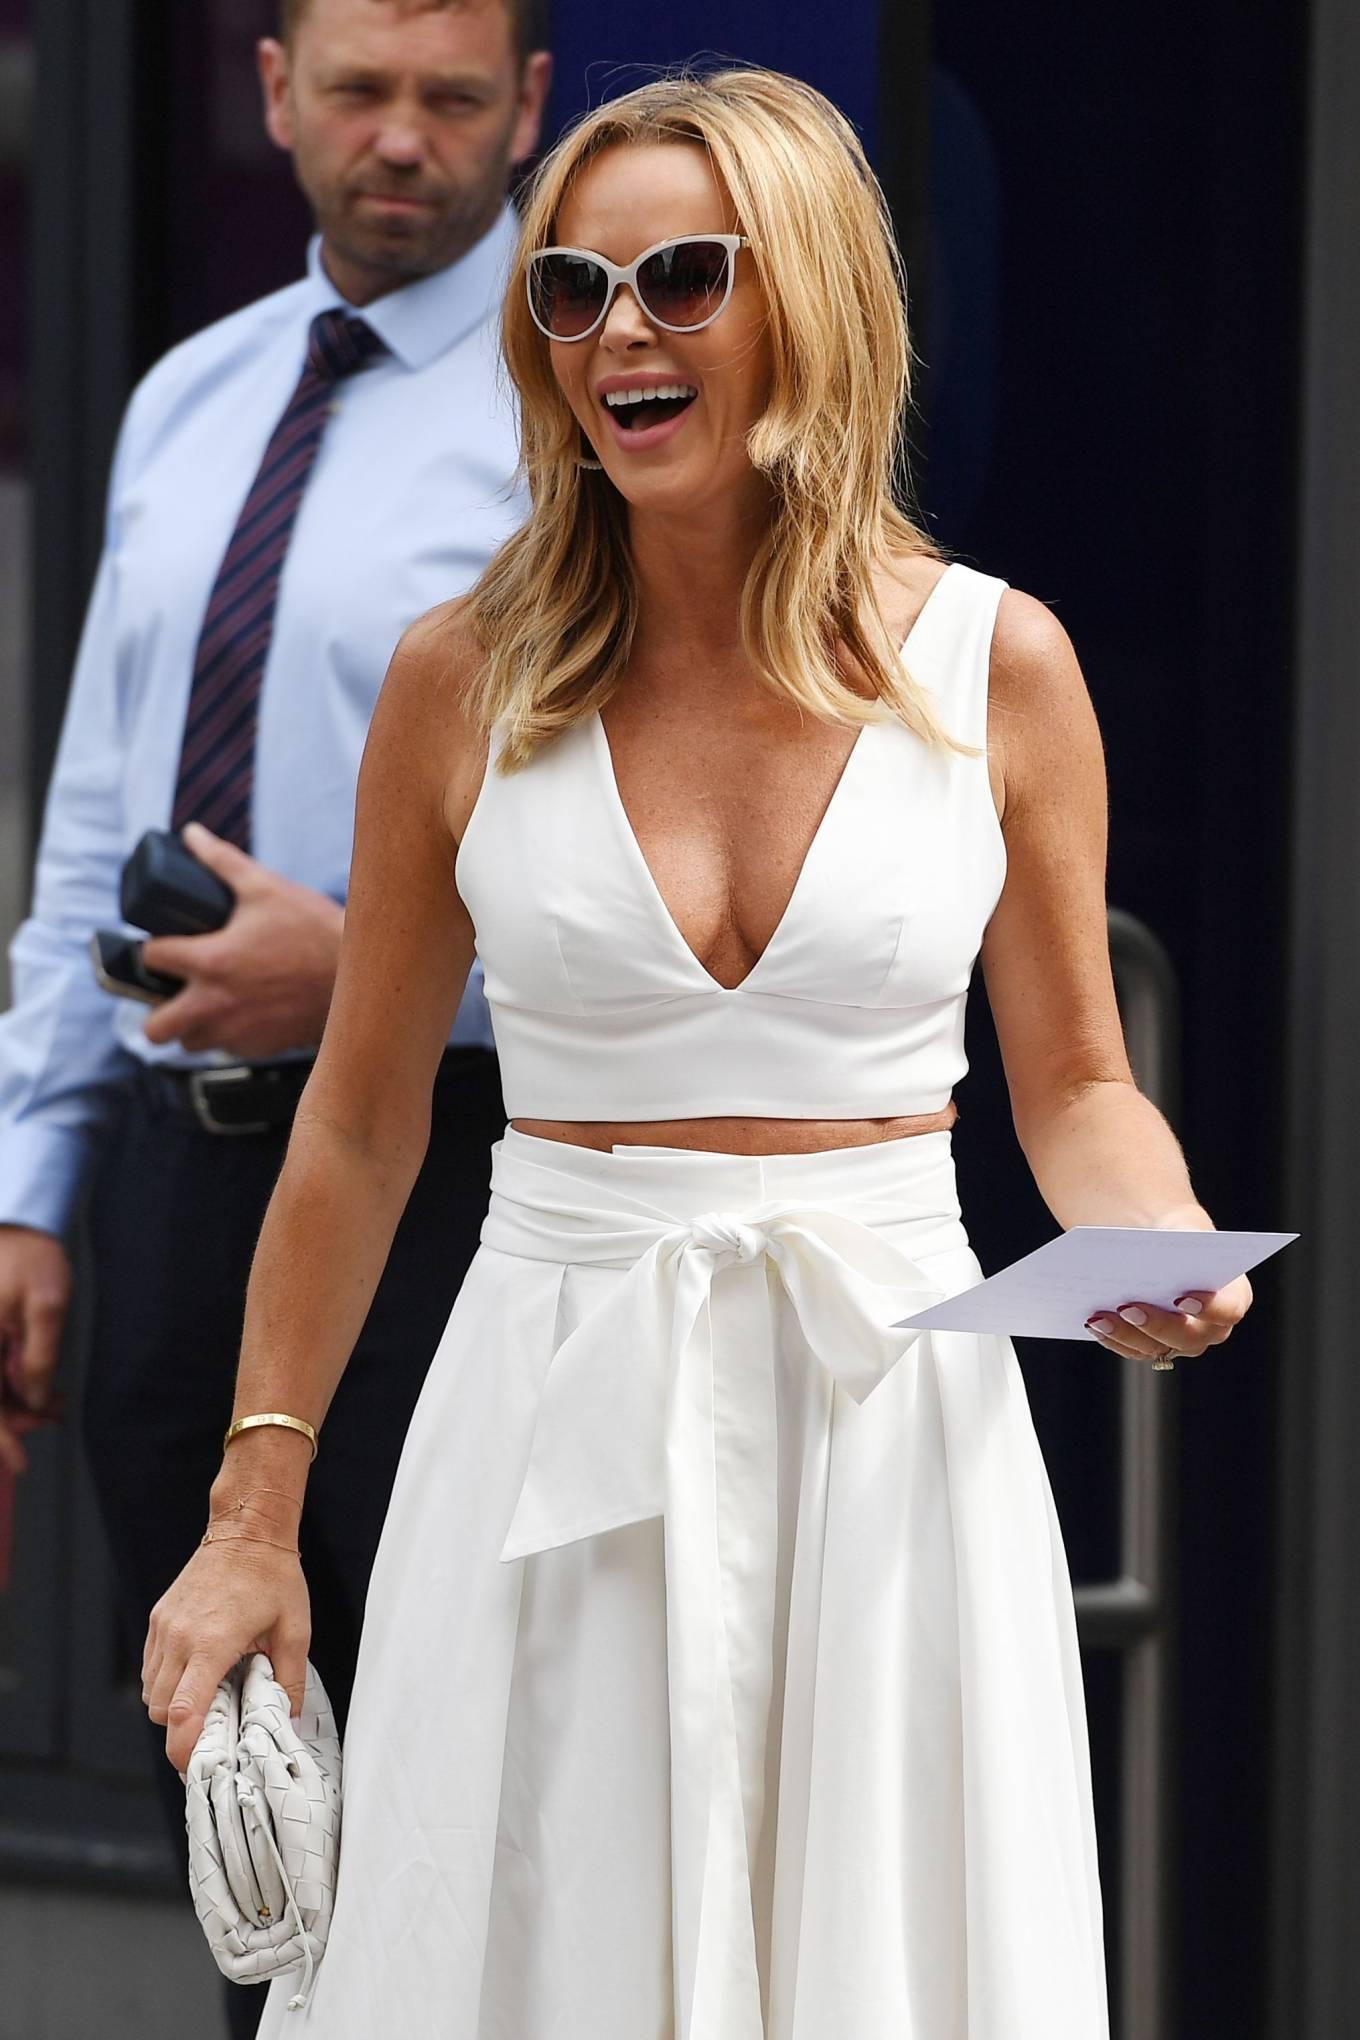 Amanda Holden 2021 : Amanda Holden – In a white dress at Global Studios in London-13